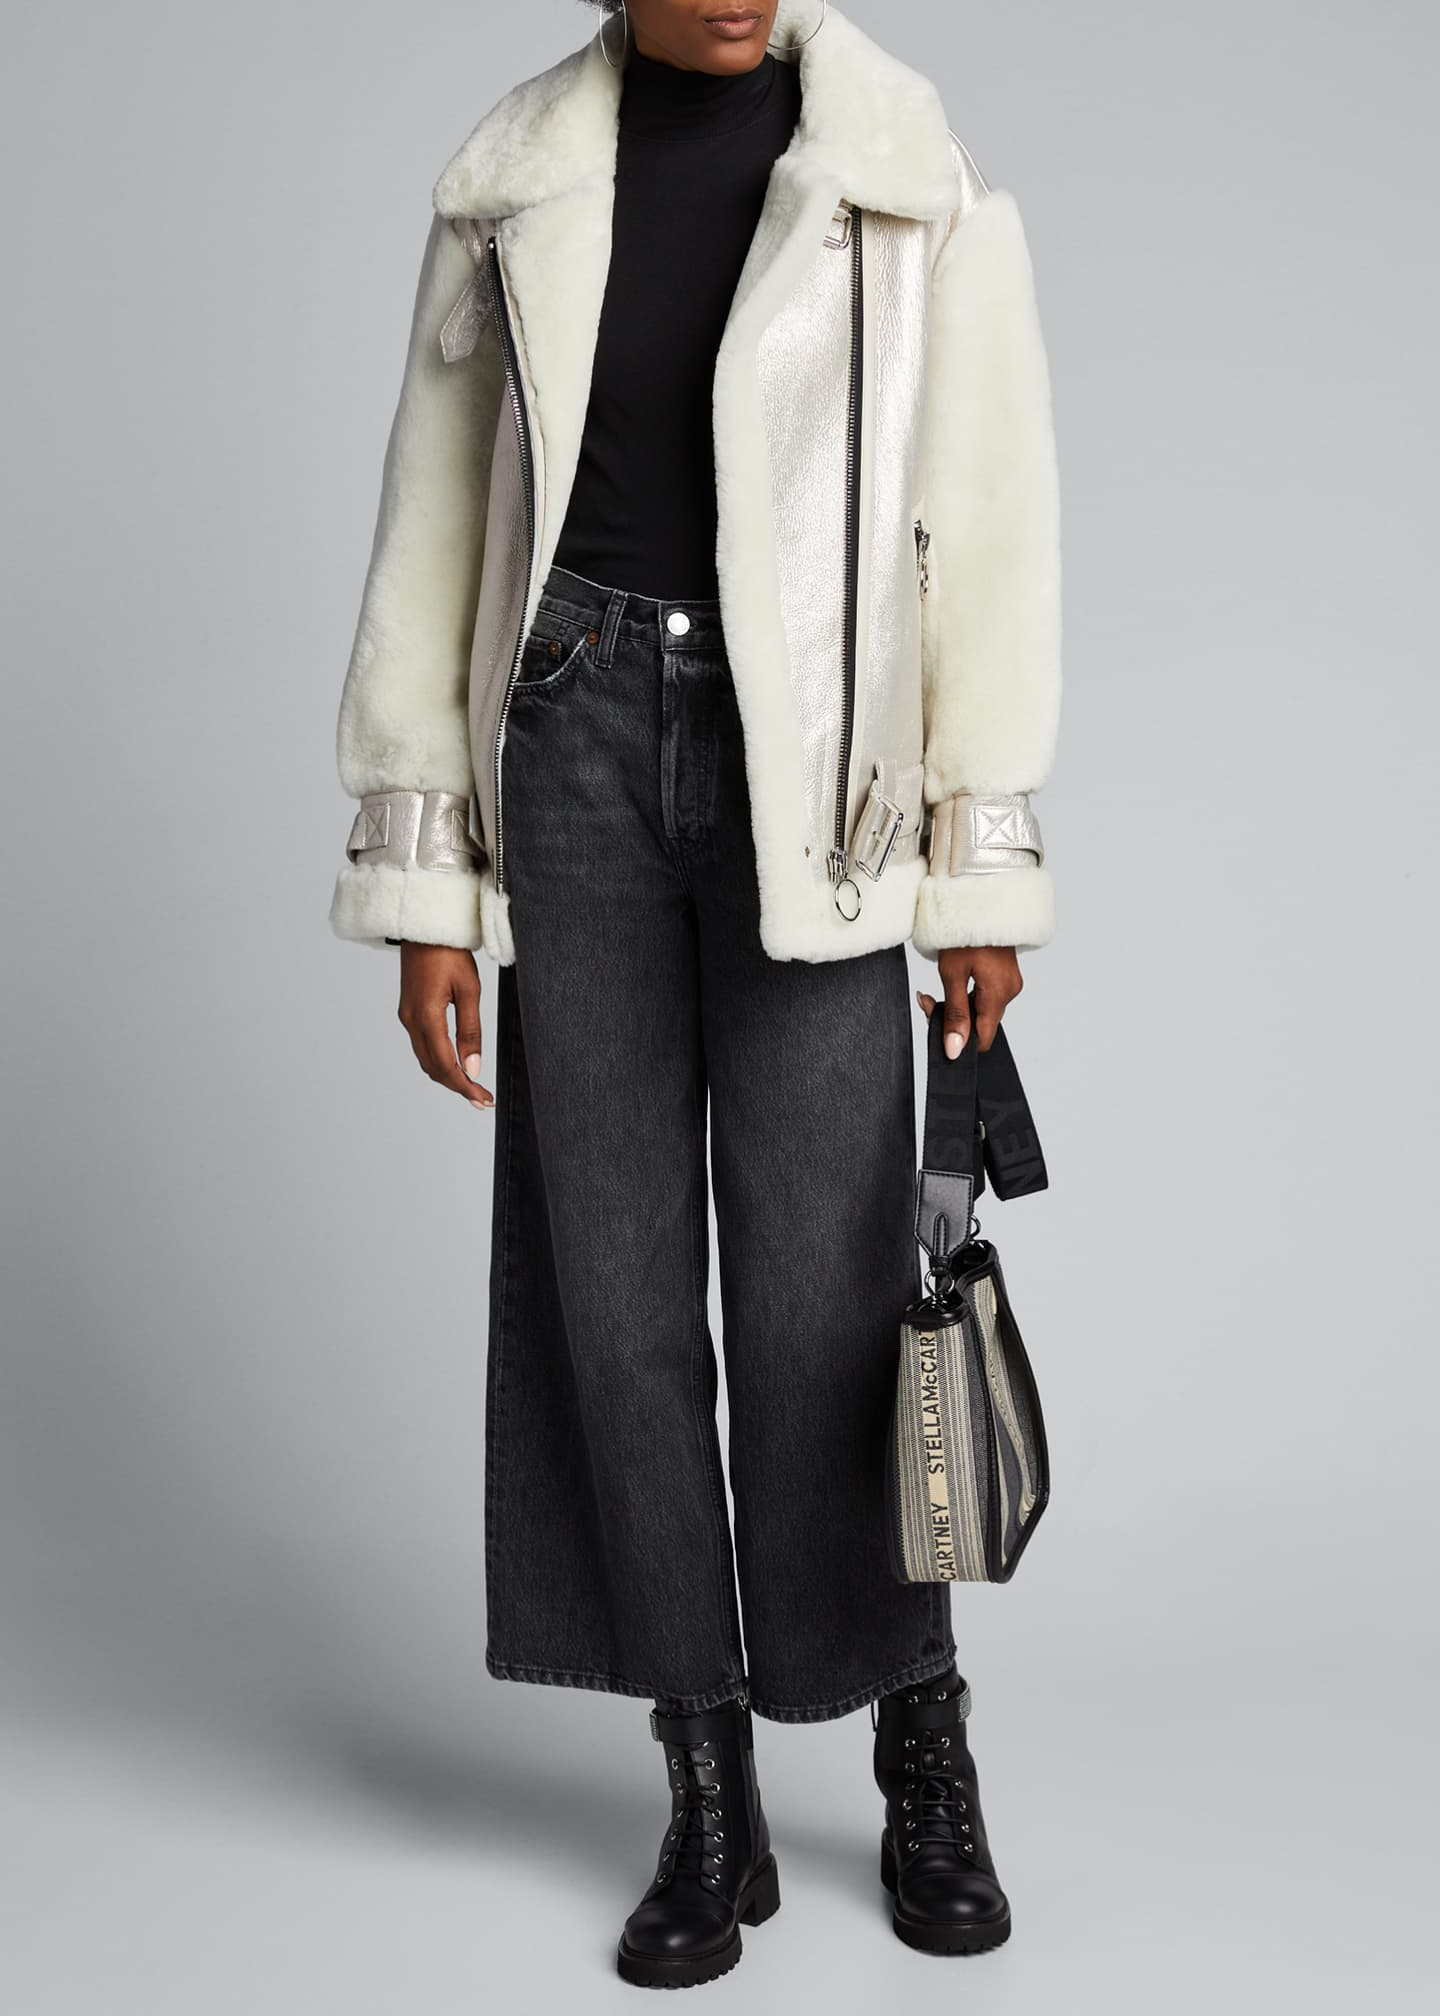 Nicole Benisti Gramercy Lamb Shearling Asymmetric-Zip Coat